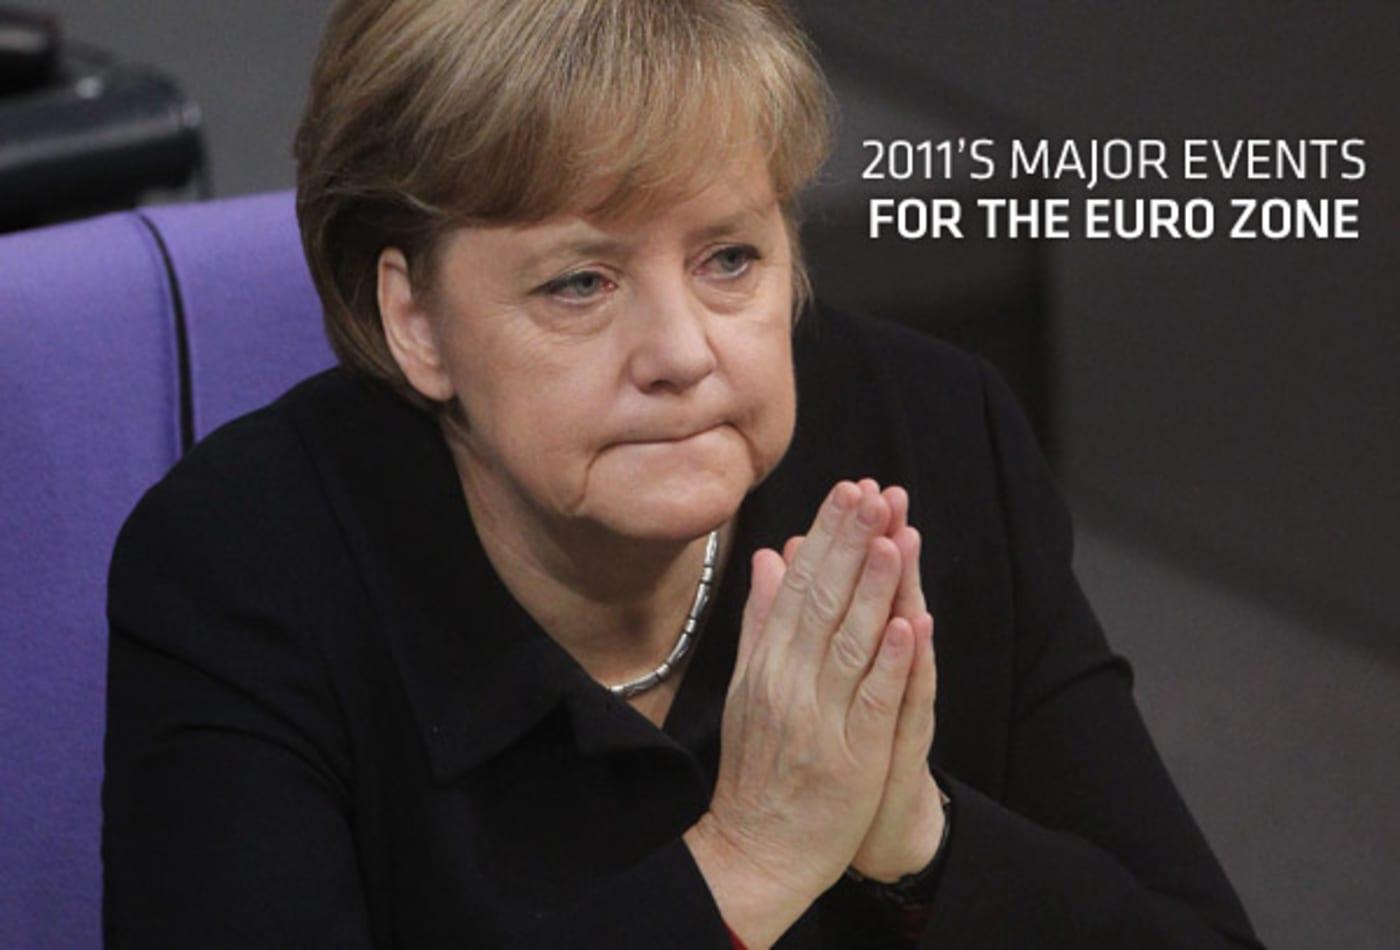 CNBC_Major_Events_Eurozone_Merkel_Intro.jpg